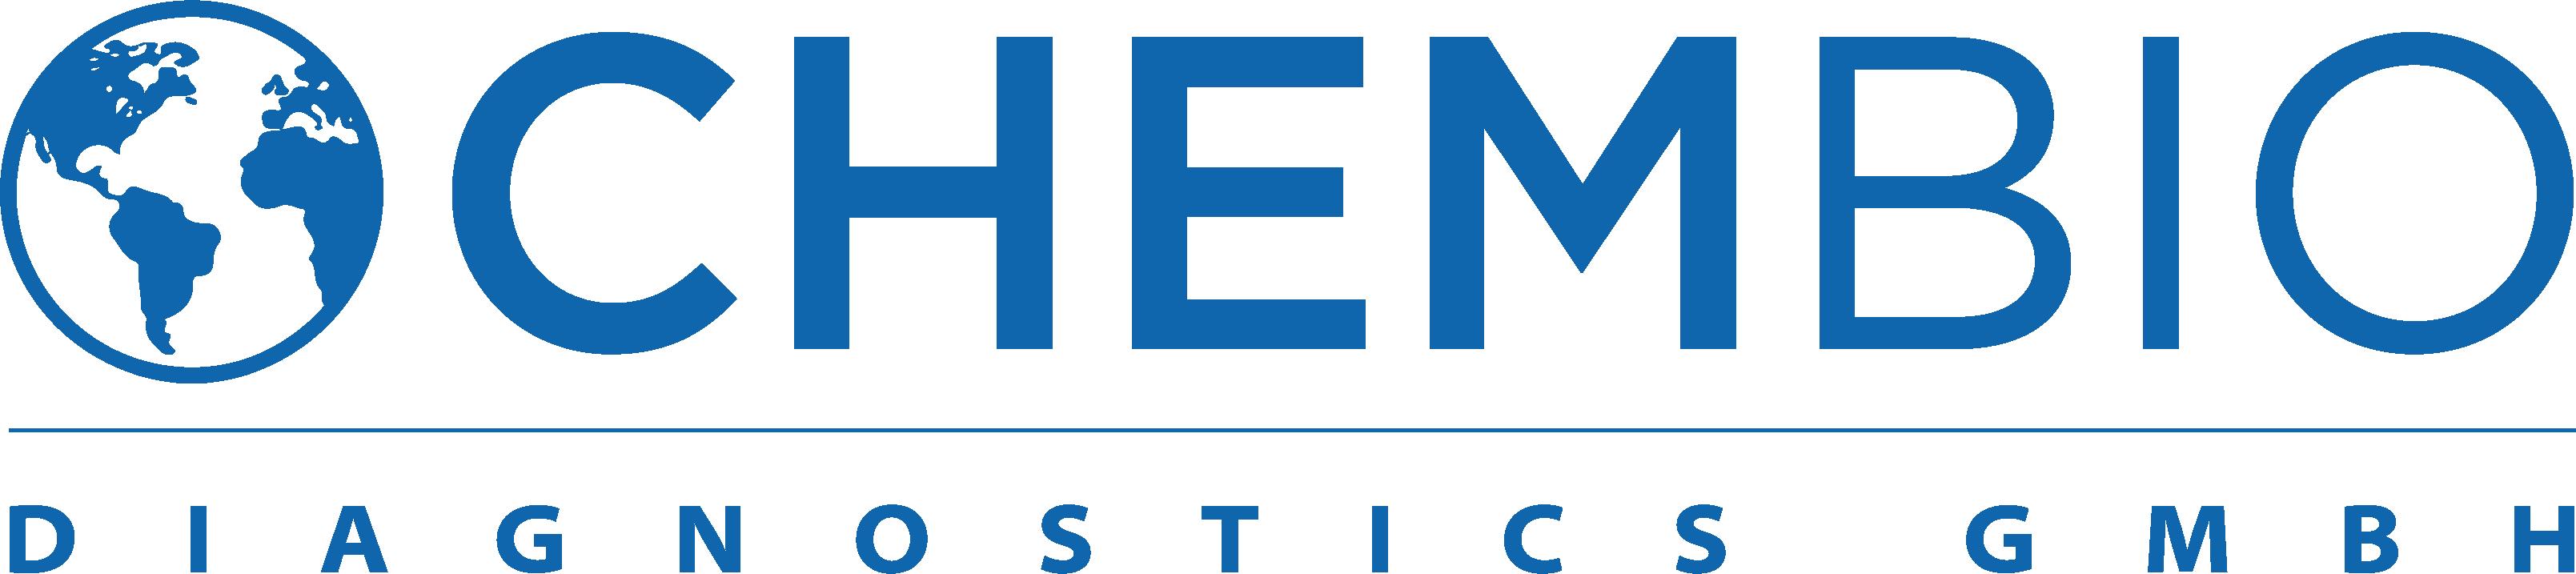 ChemBio-Logo-Germany RGB Office